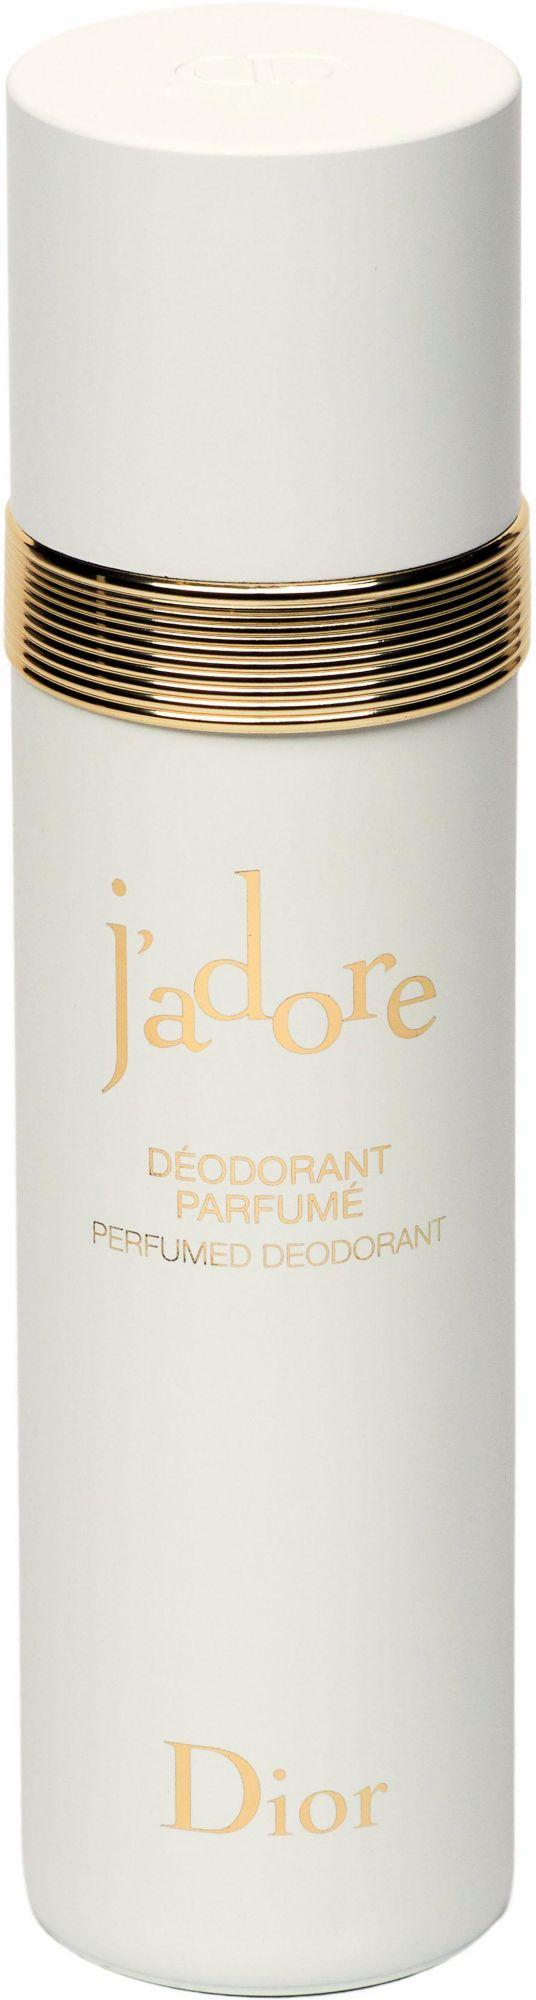 DIOR Dior, »J'adore«, Deodorant